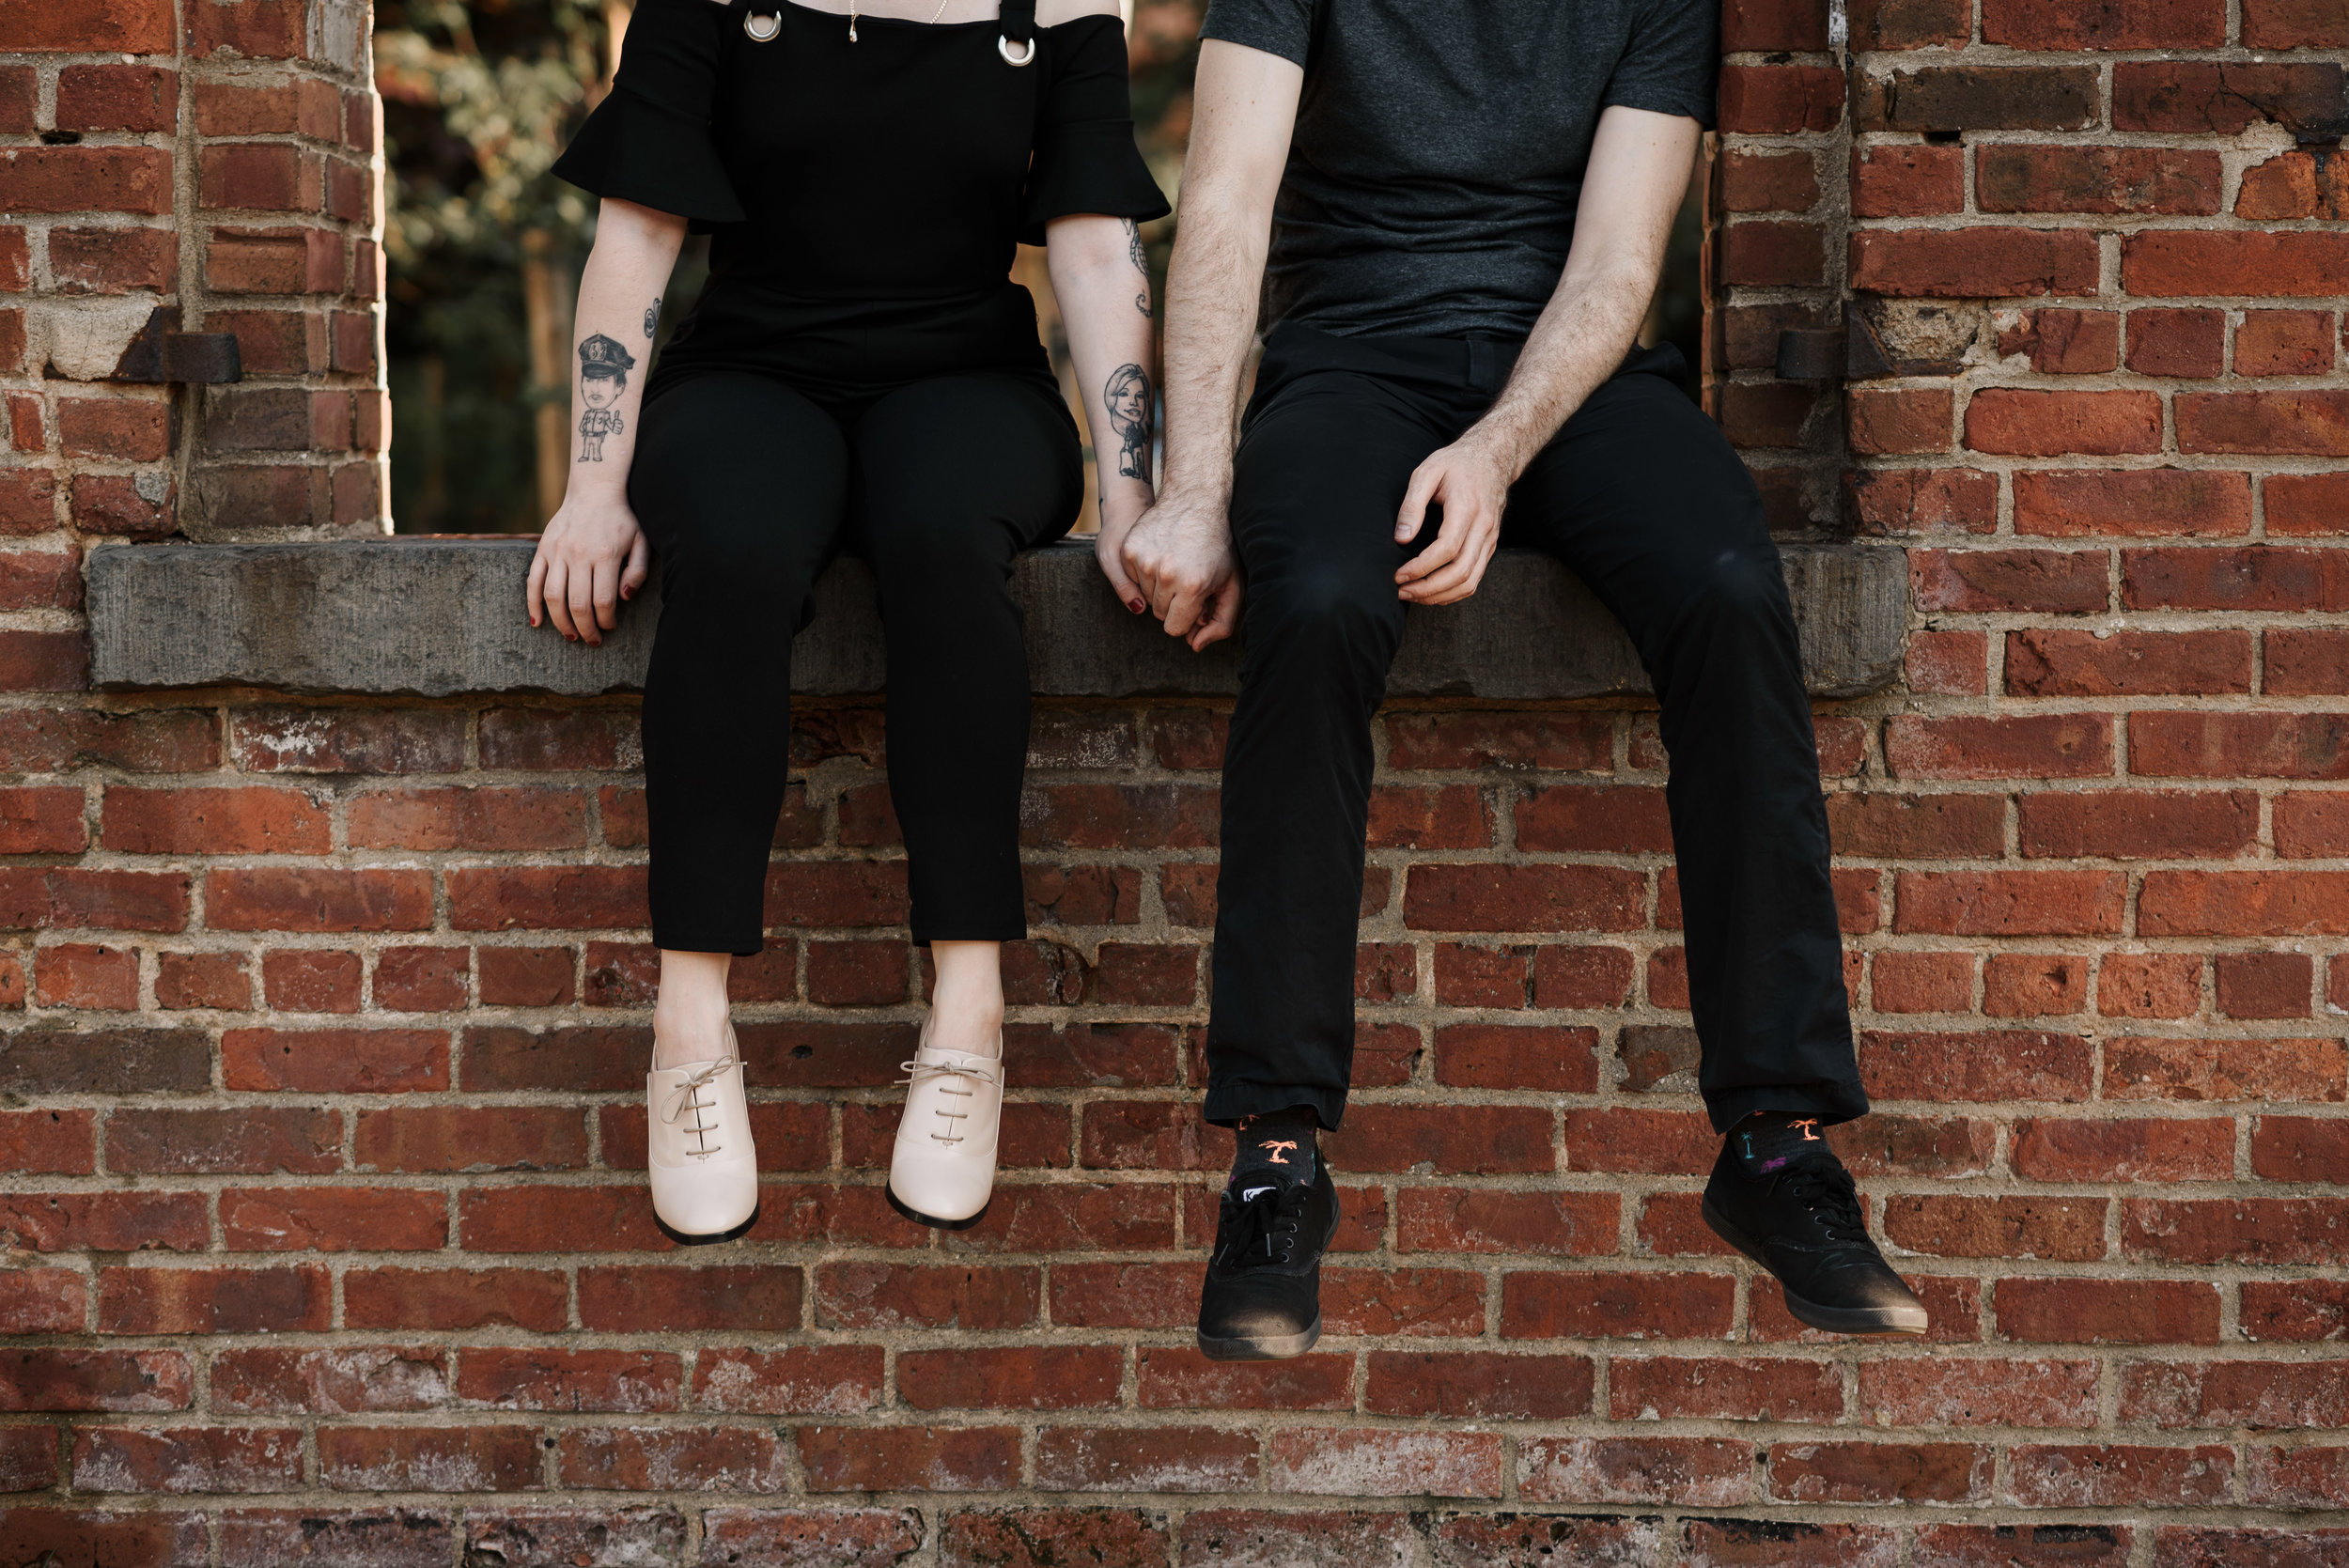 Megan+Elliot+Proposal-6306.jpg